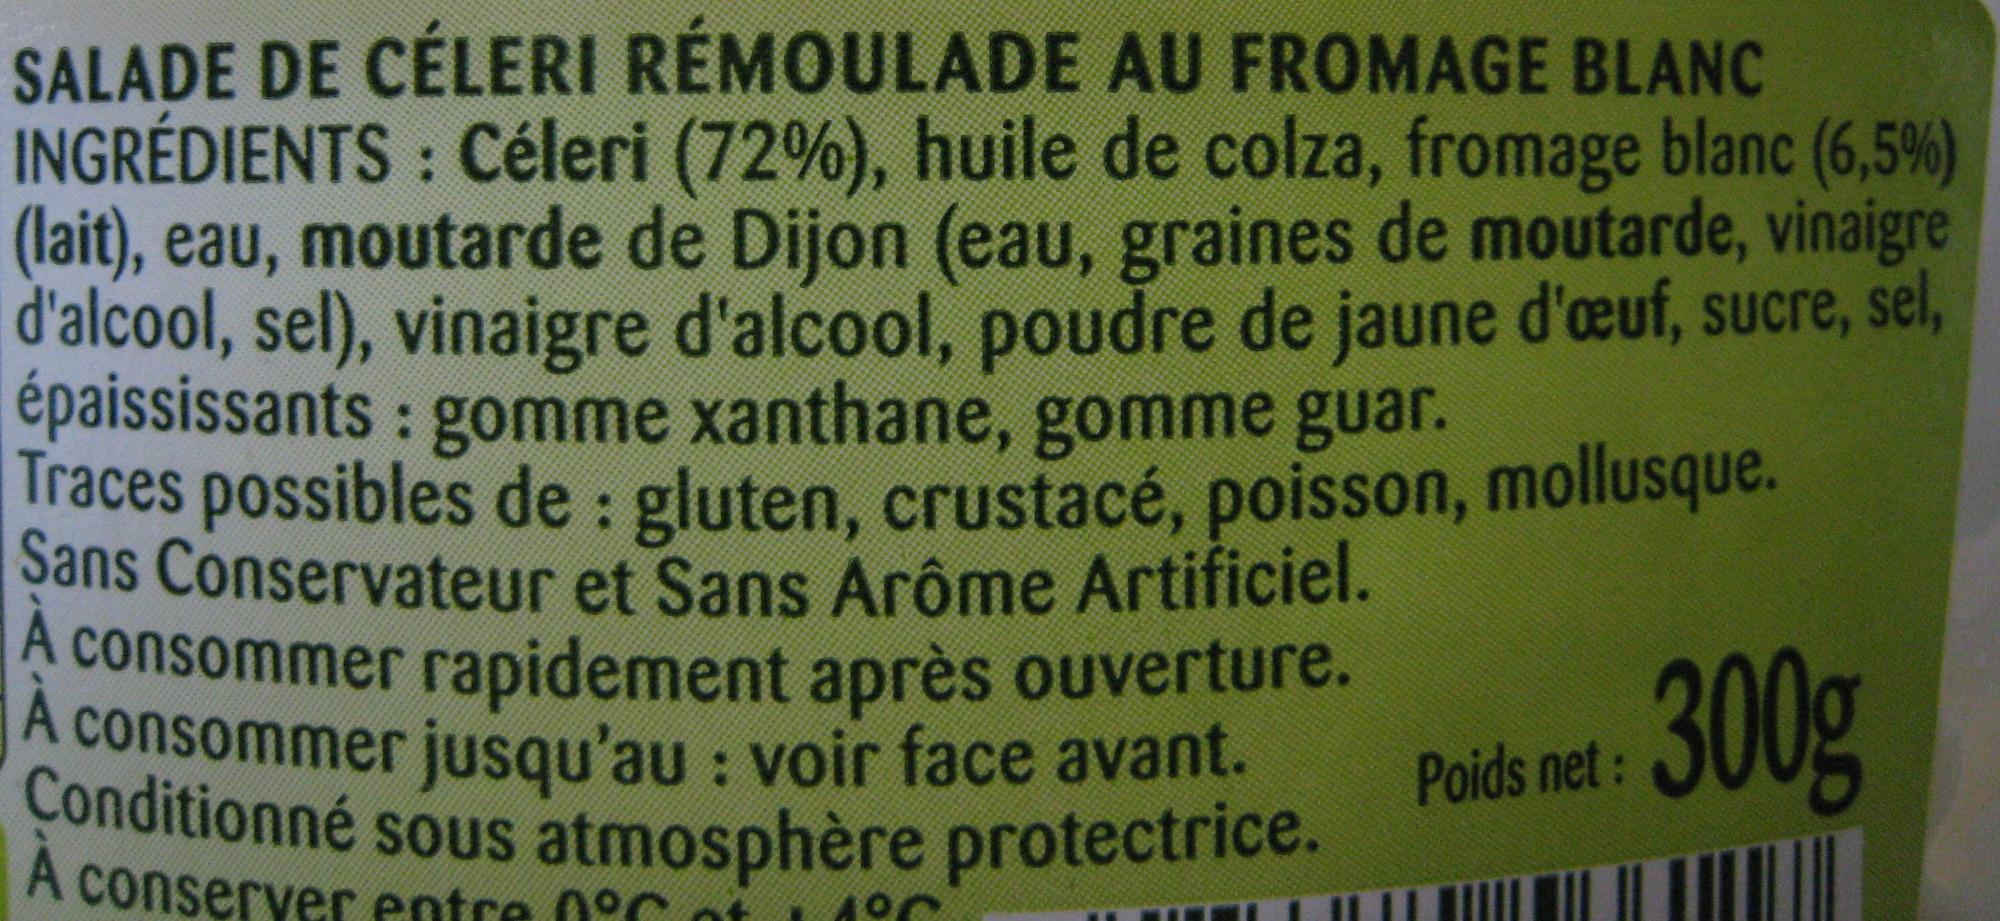 Céleri rémoulade au Fromage Blanc - Ingrediënten